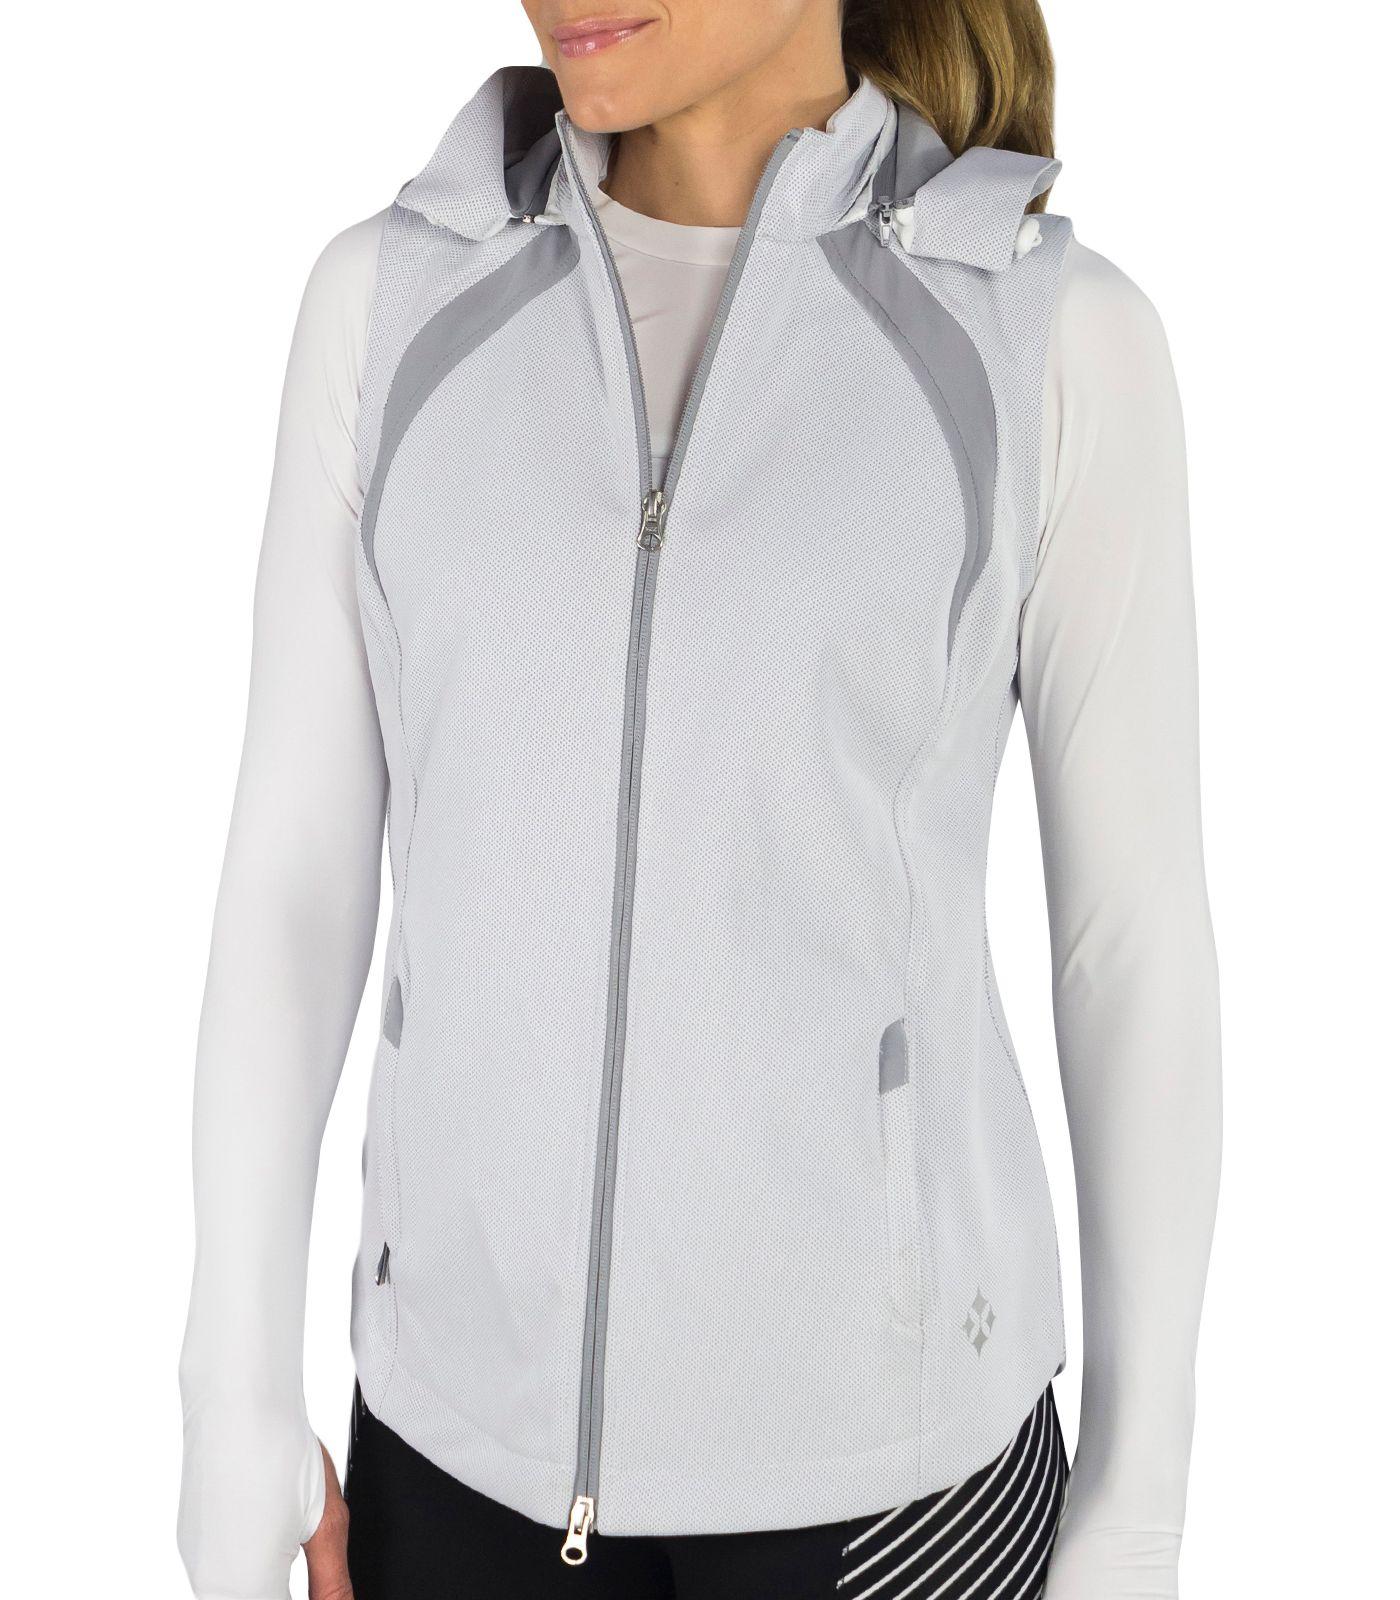 Jofit Women's Sprint Golf Vest